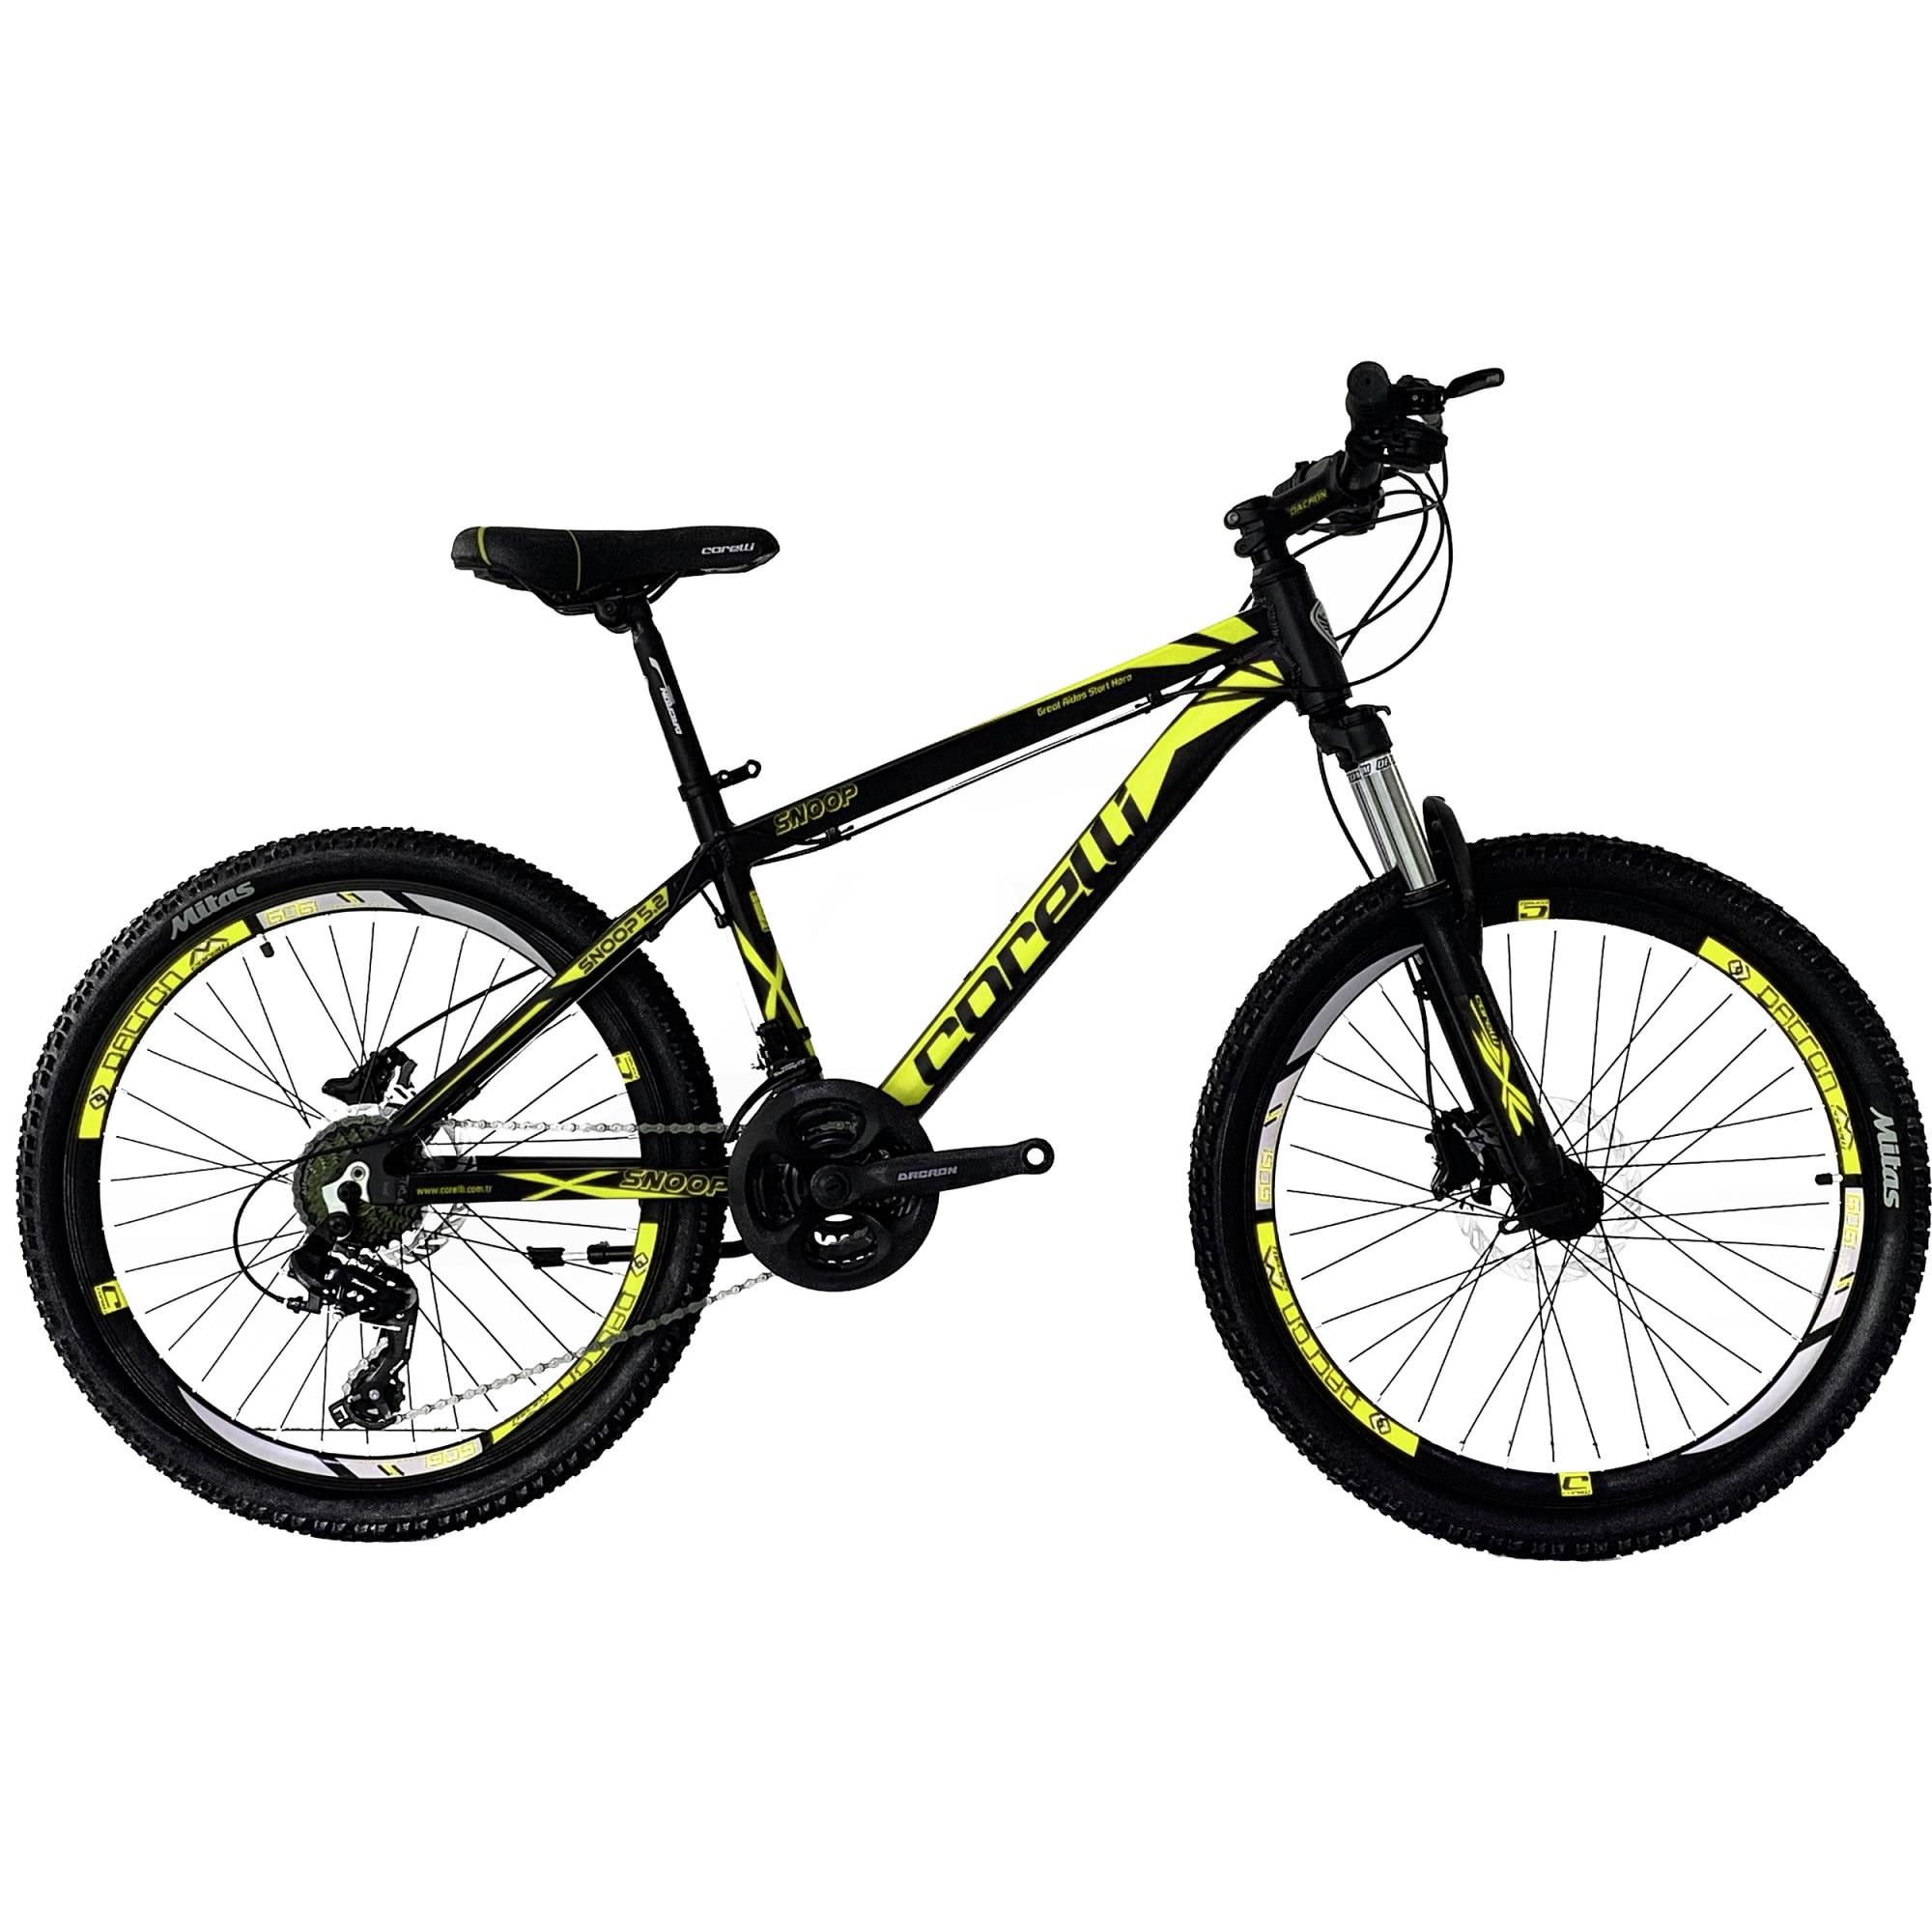 "Fotografie Bicicleta MTB copii, 24"" SNOOP 5.2, marime cadru 35.5 cm, negru-galben"